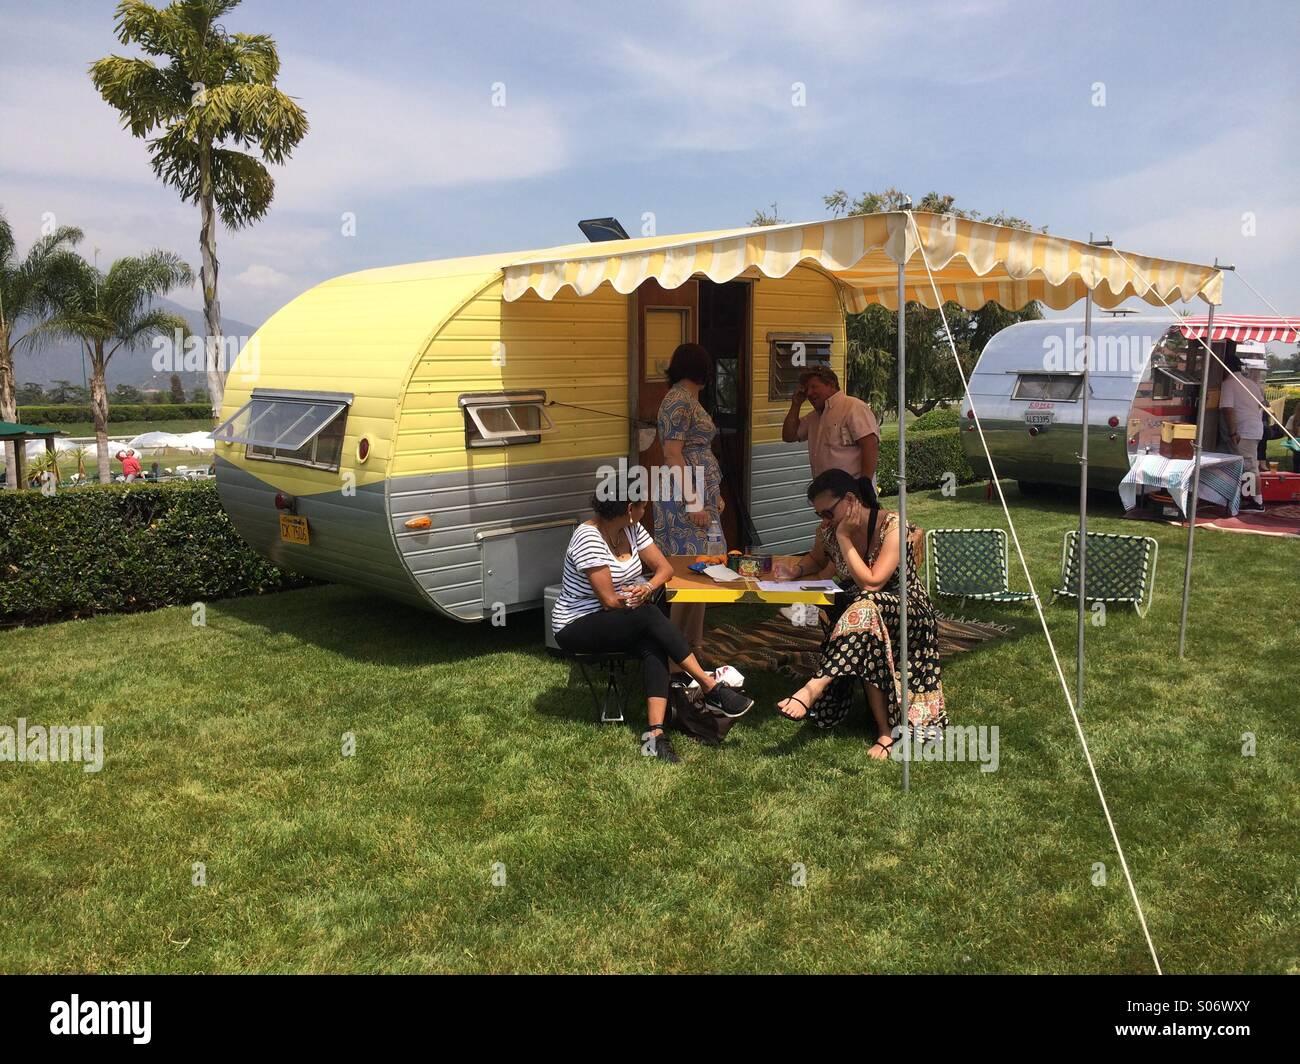 Vintage Mini Camper On Display At Santa Anita